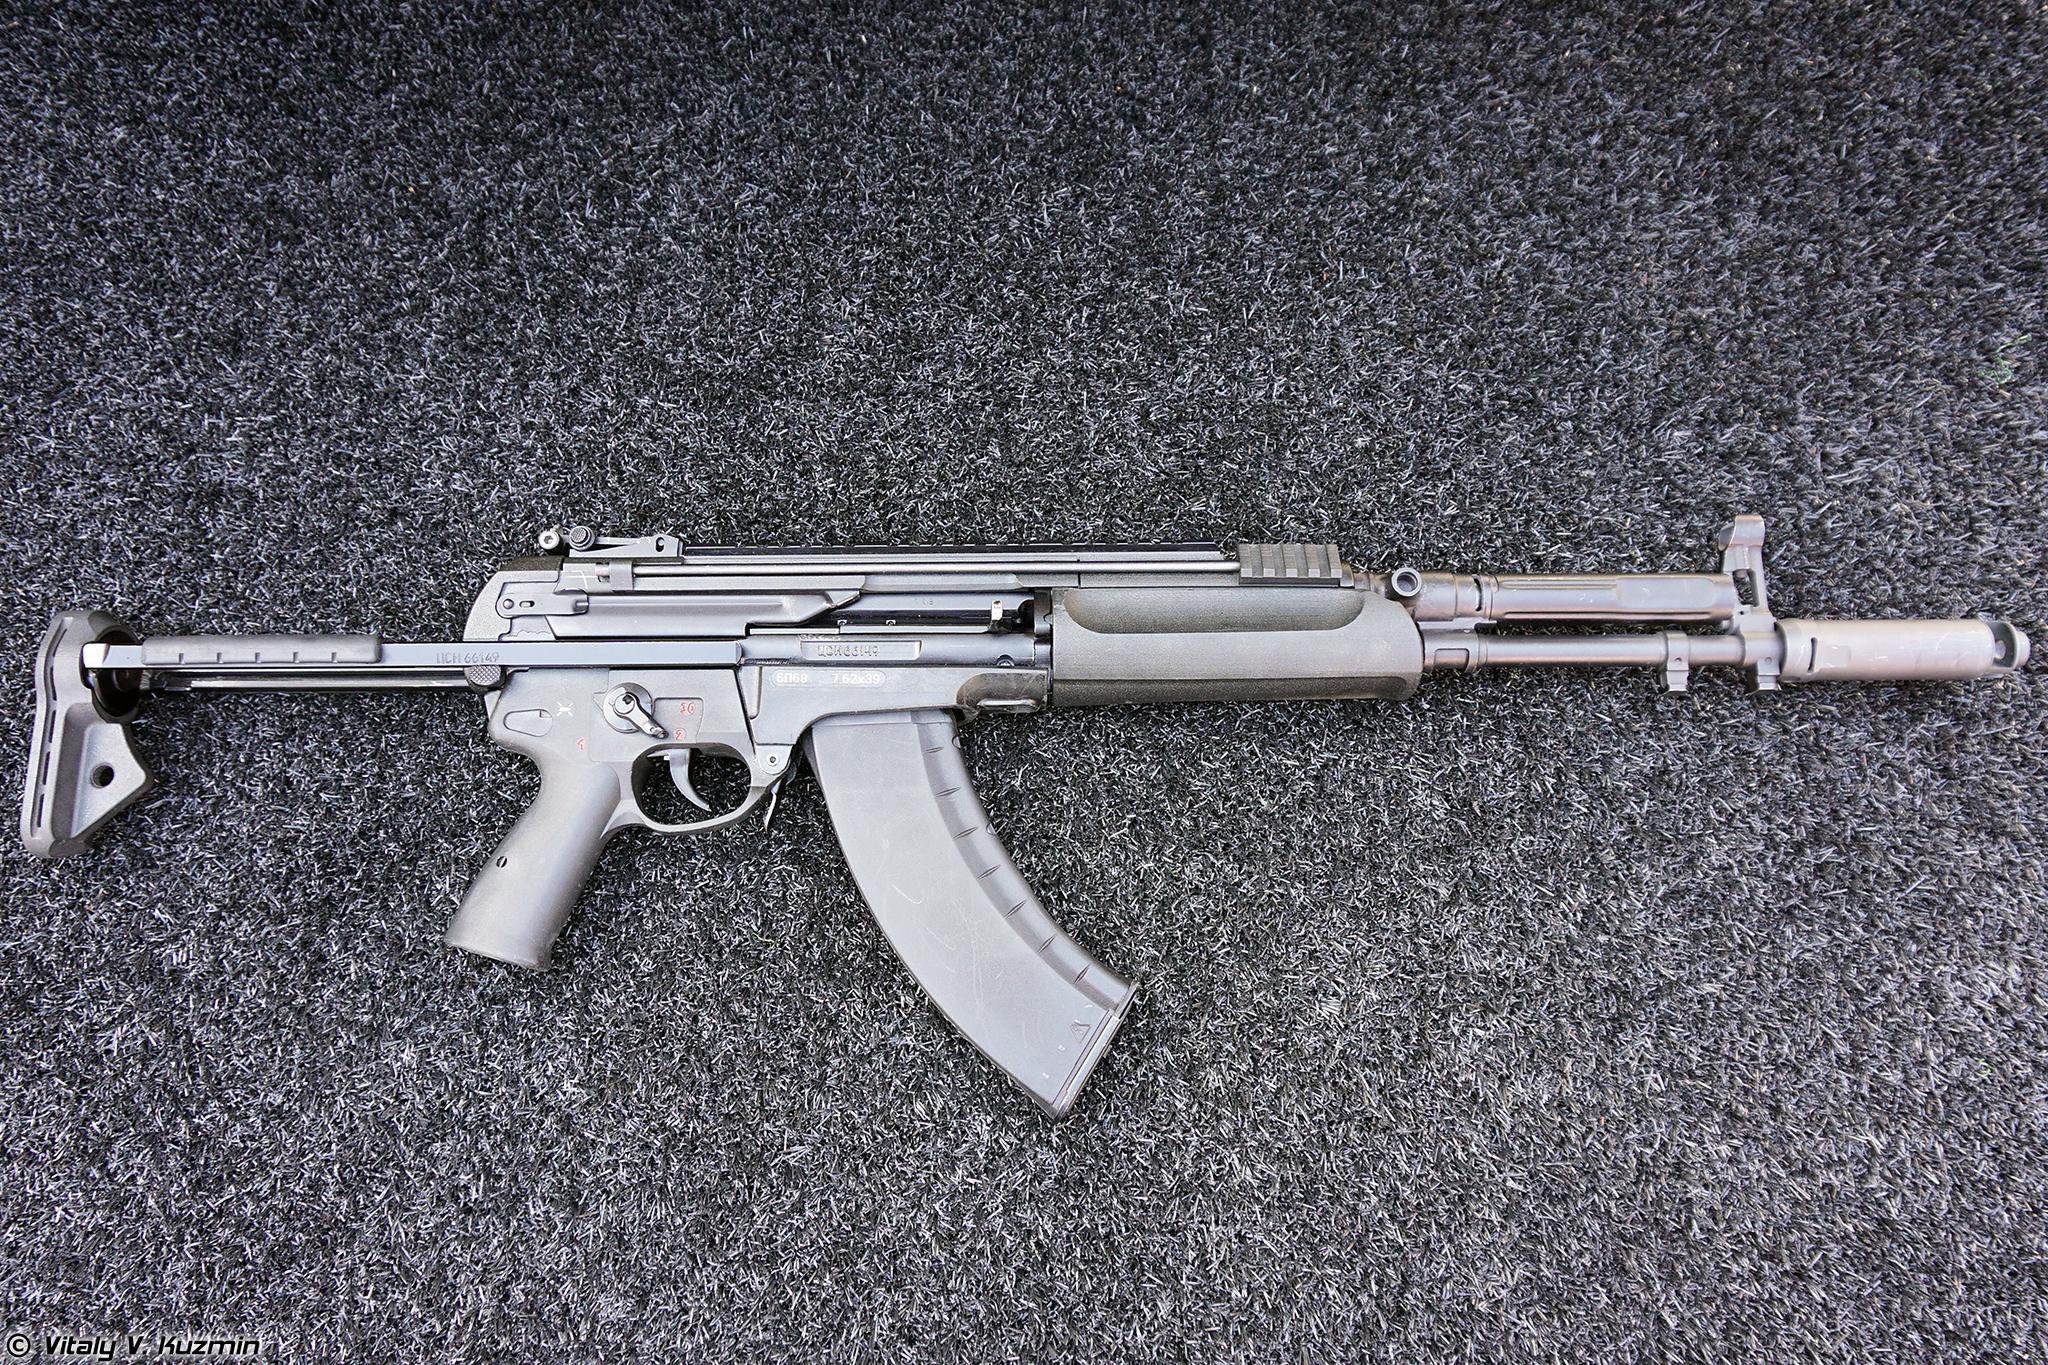 Russian Assault Rifles/Carbines/Machine Guns Thread: #2 - Page 10 Army-2020-Pavilions-021-X4